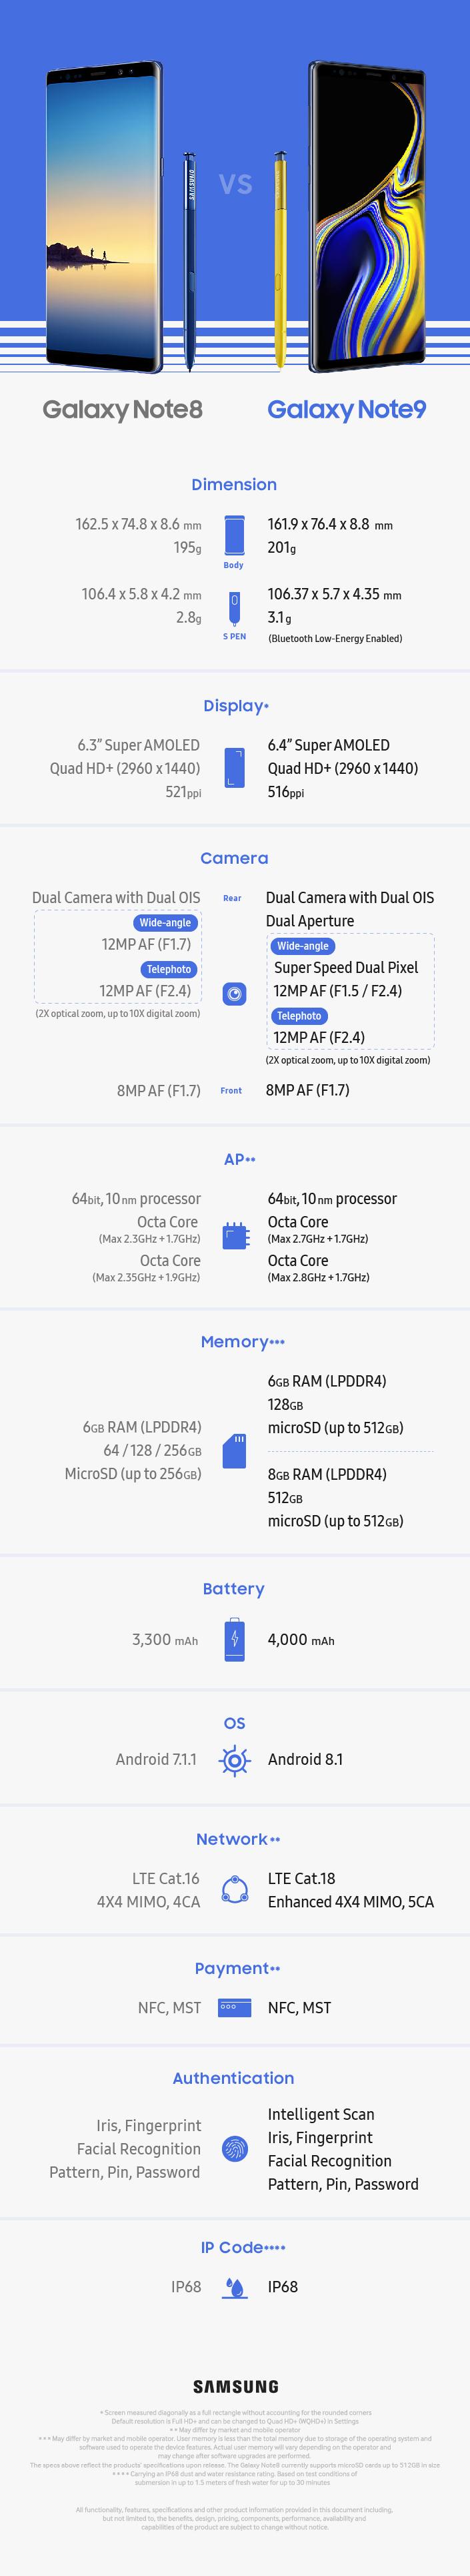 Samsung GALAXY Note 9 Note 8 Diferentele 1